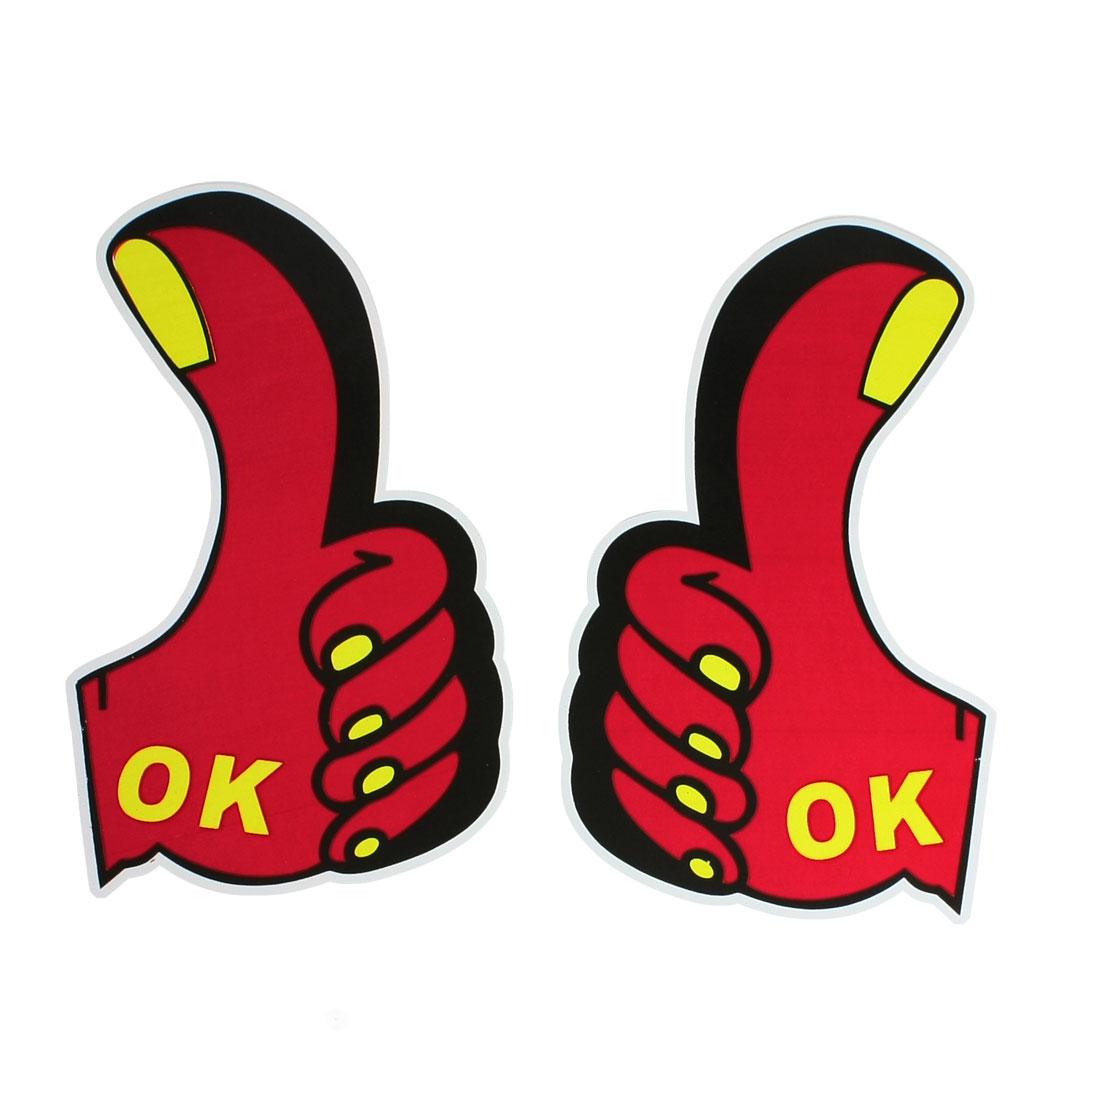 2 Pcs Red Yellow OK Letters Printed Car Decorative Big Thumb Shape Sticker